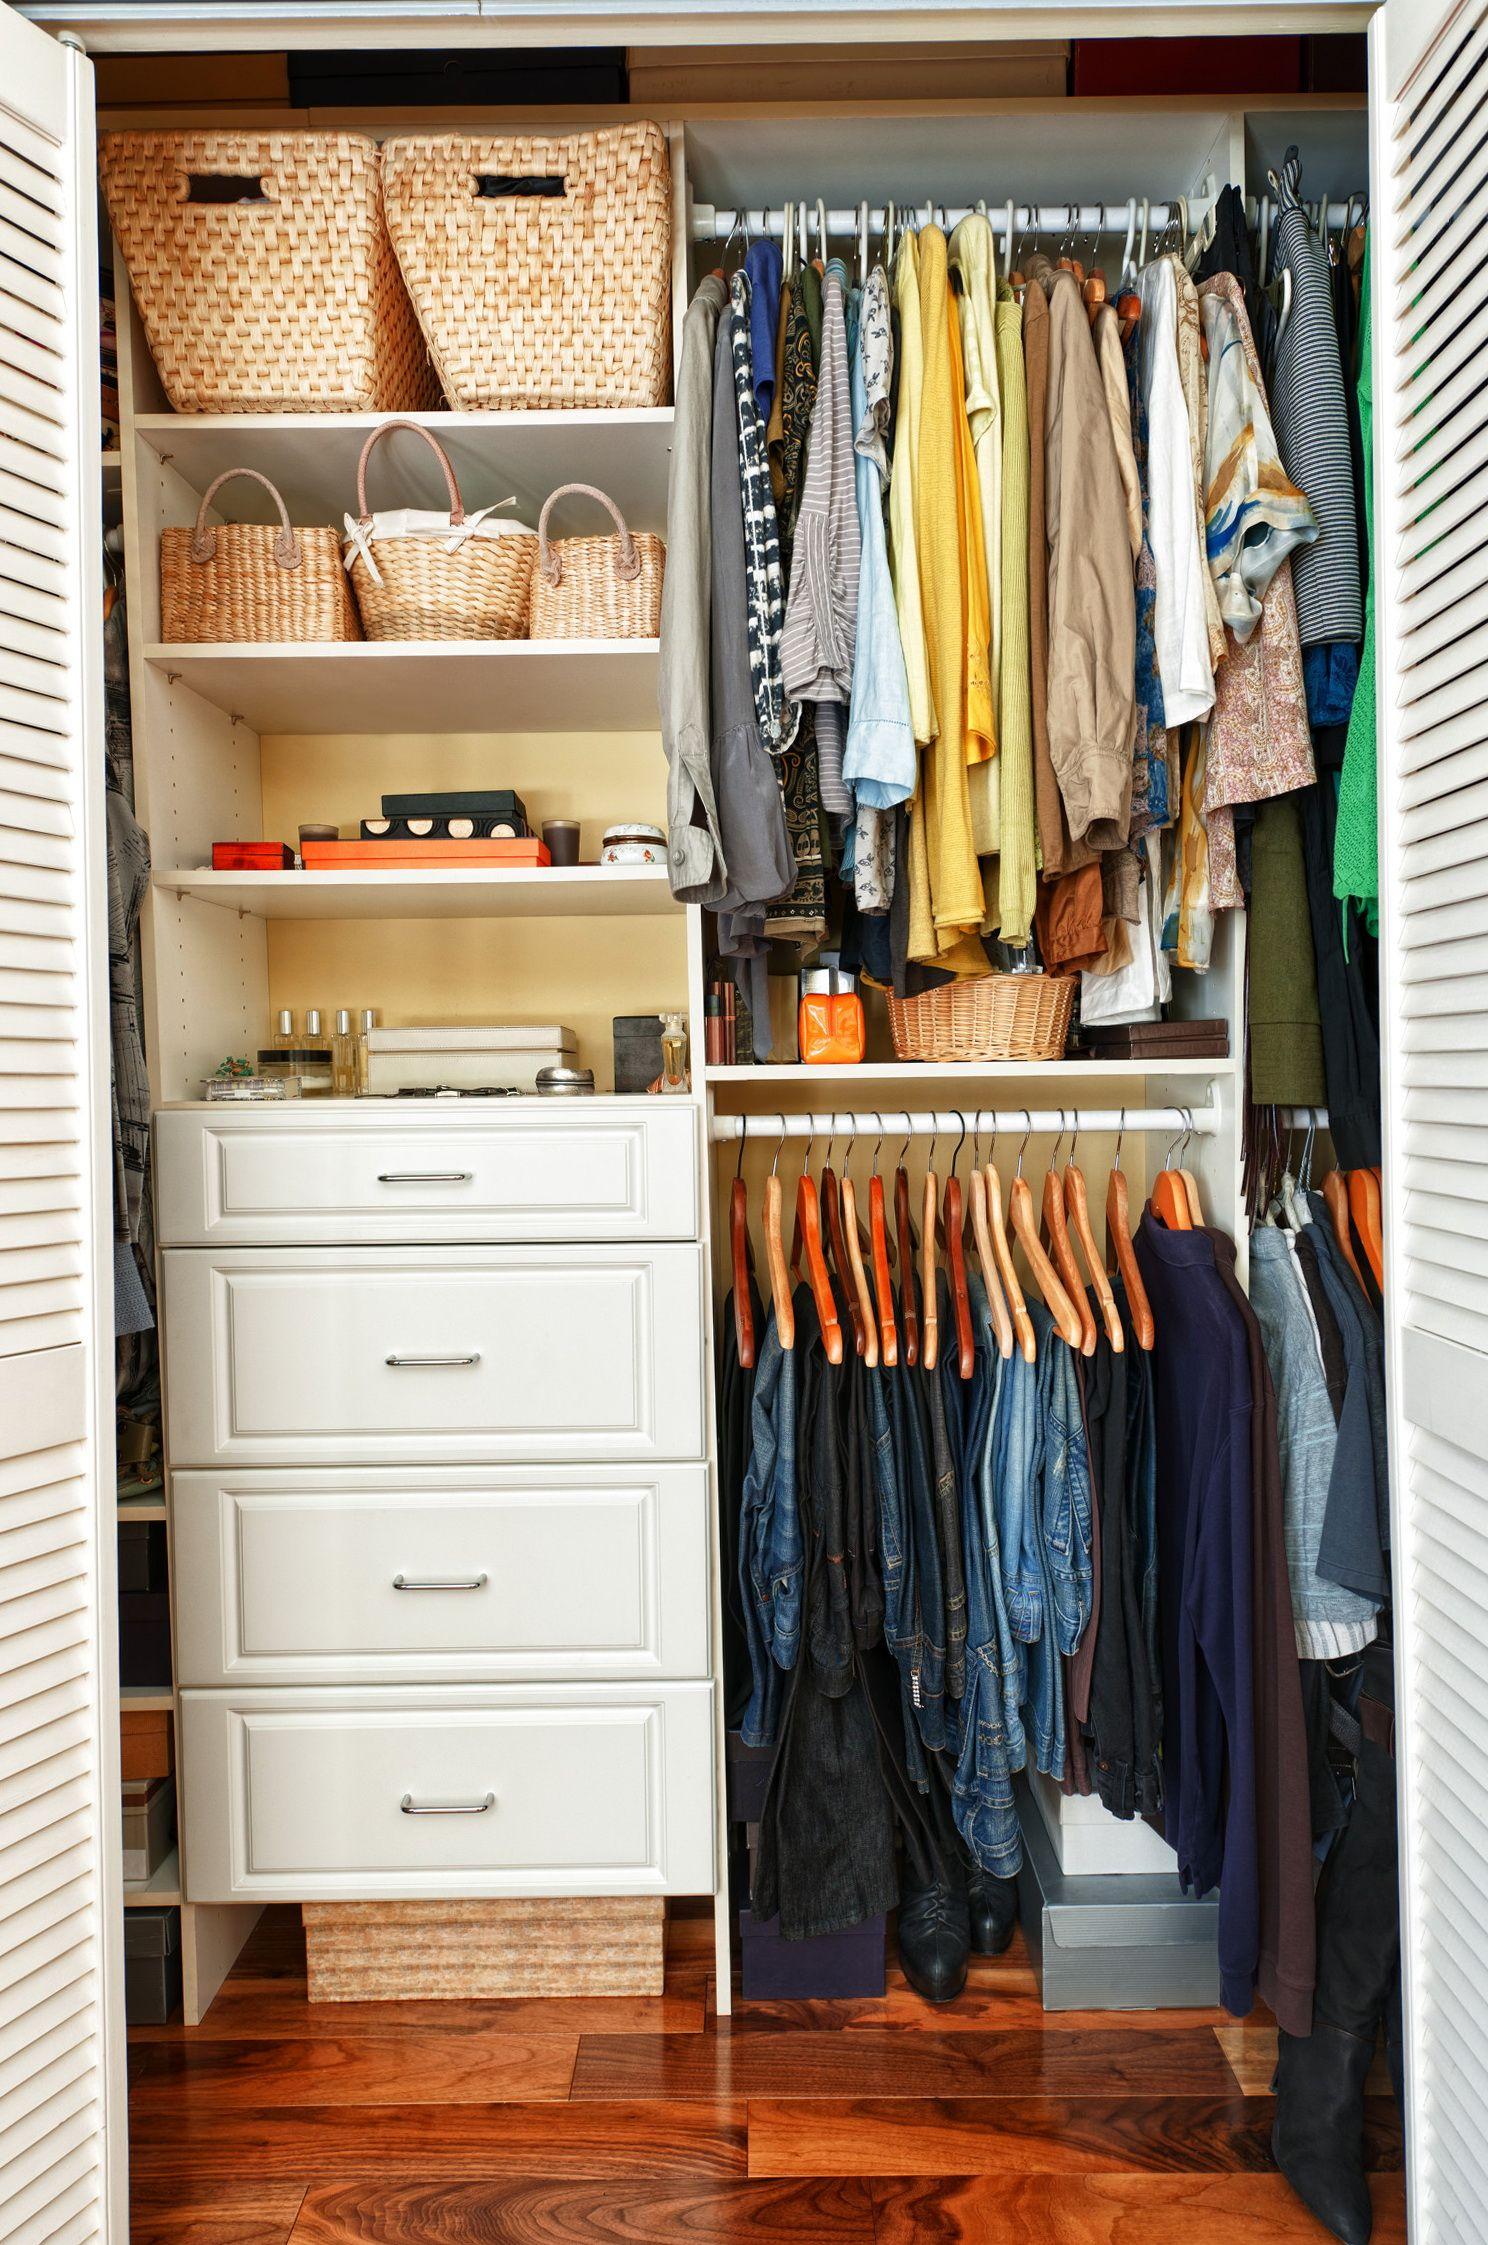 Small Bedroom Closet Design Ideas Magnificent Archaic Diy Closet Organization Hacks  Roselawnlutheran  Closets Decorating Inspiration